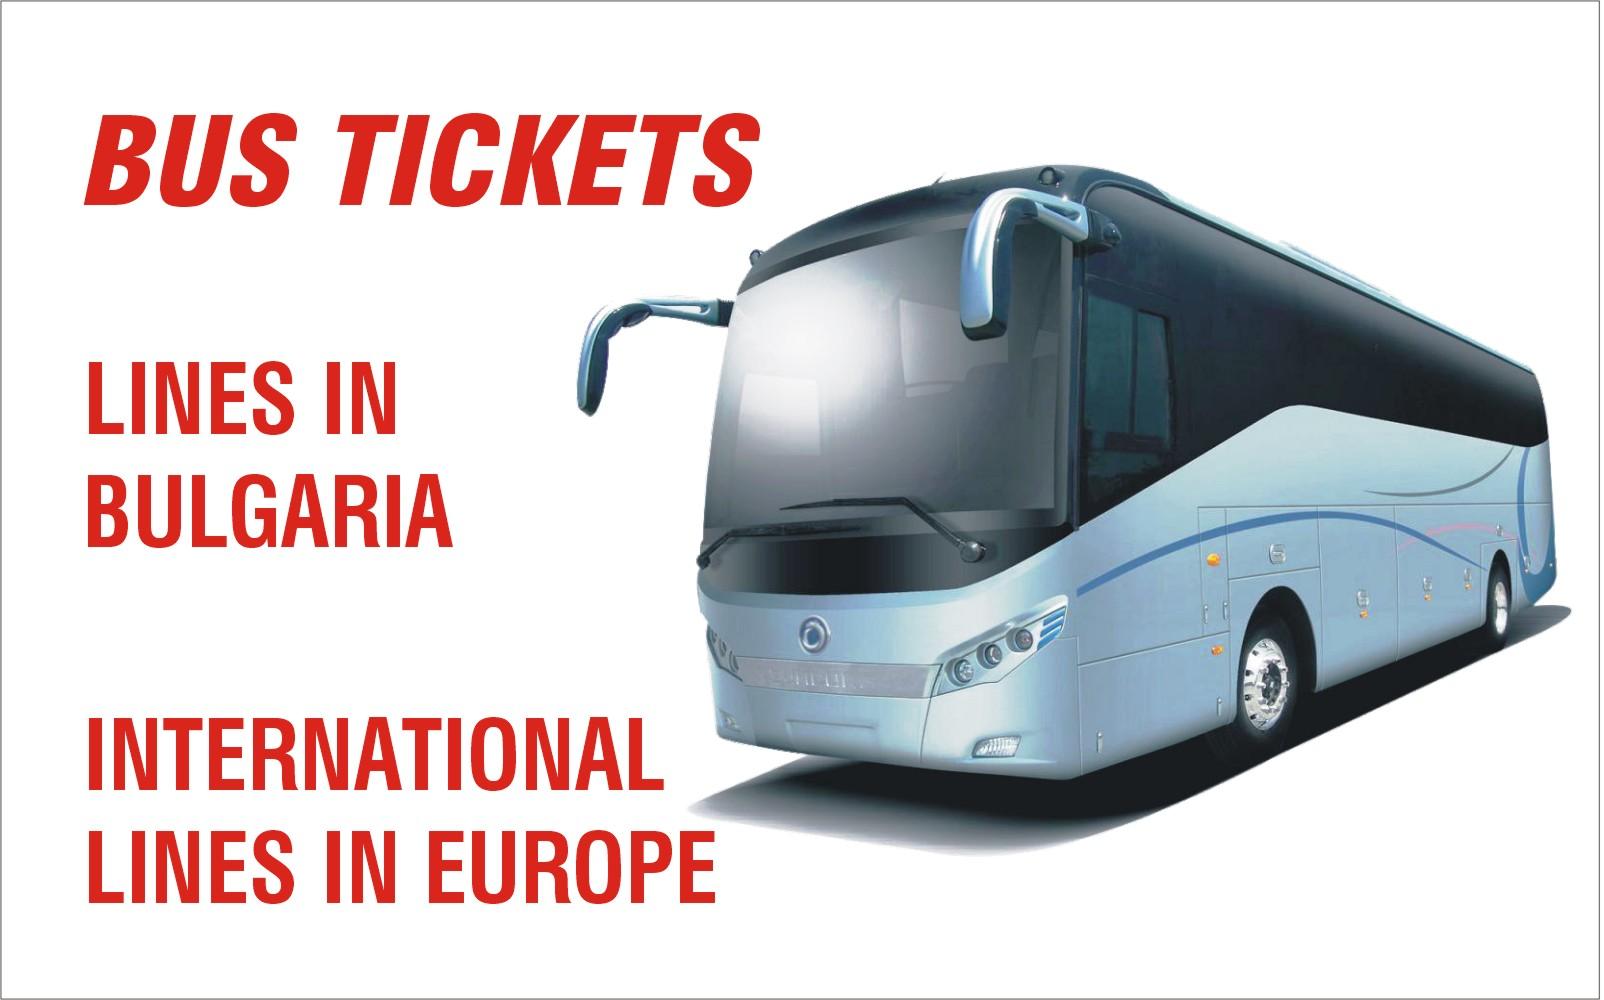 viva tours bulgaria travel agency - air tickets, bus tickets